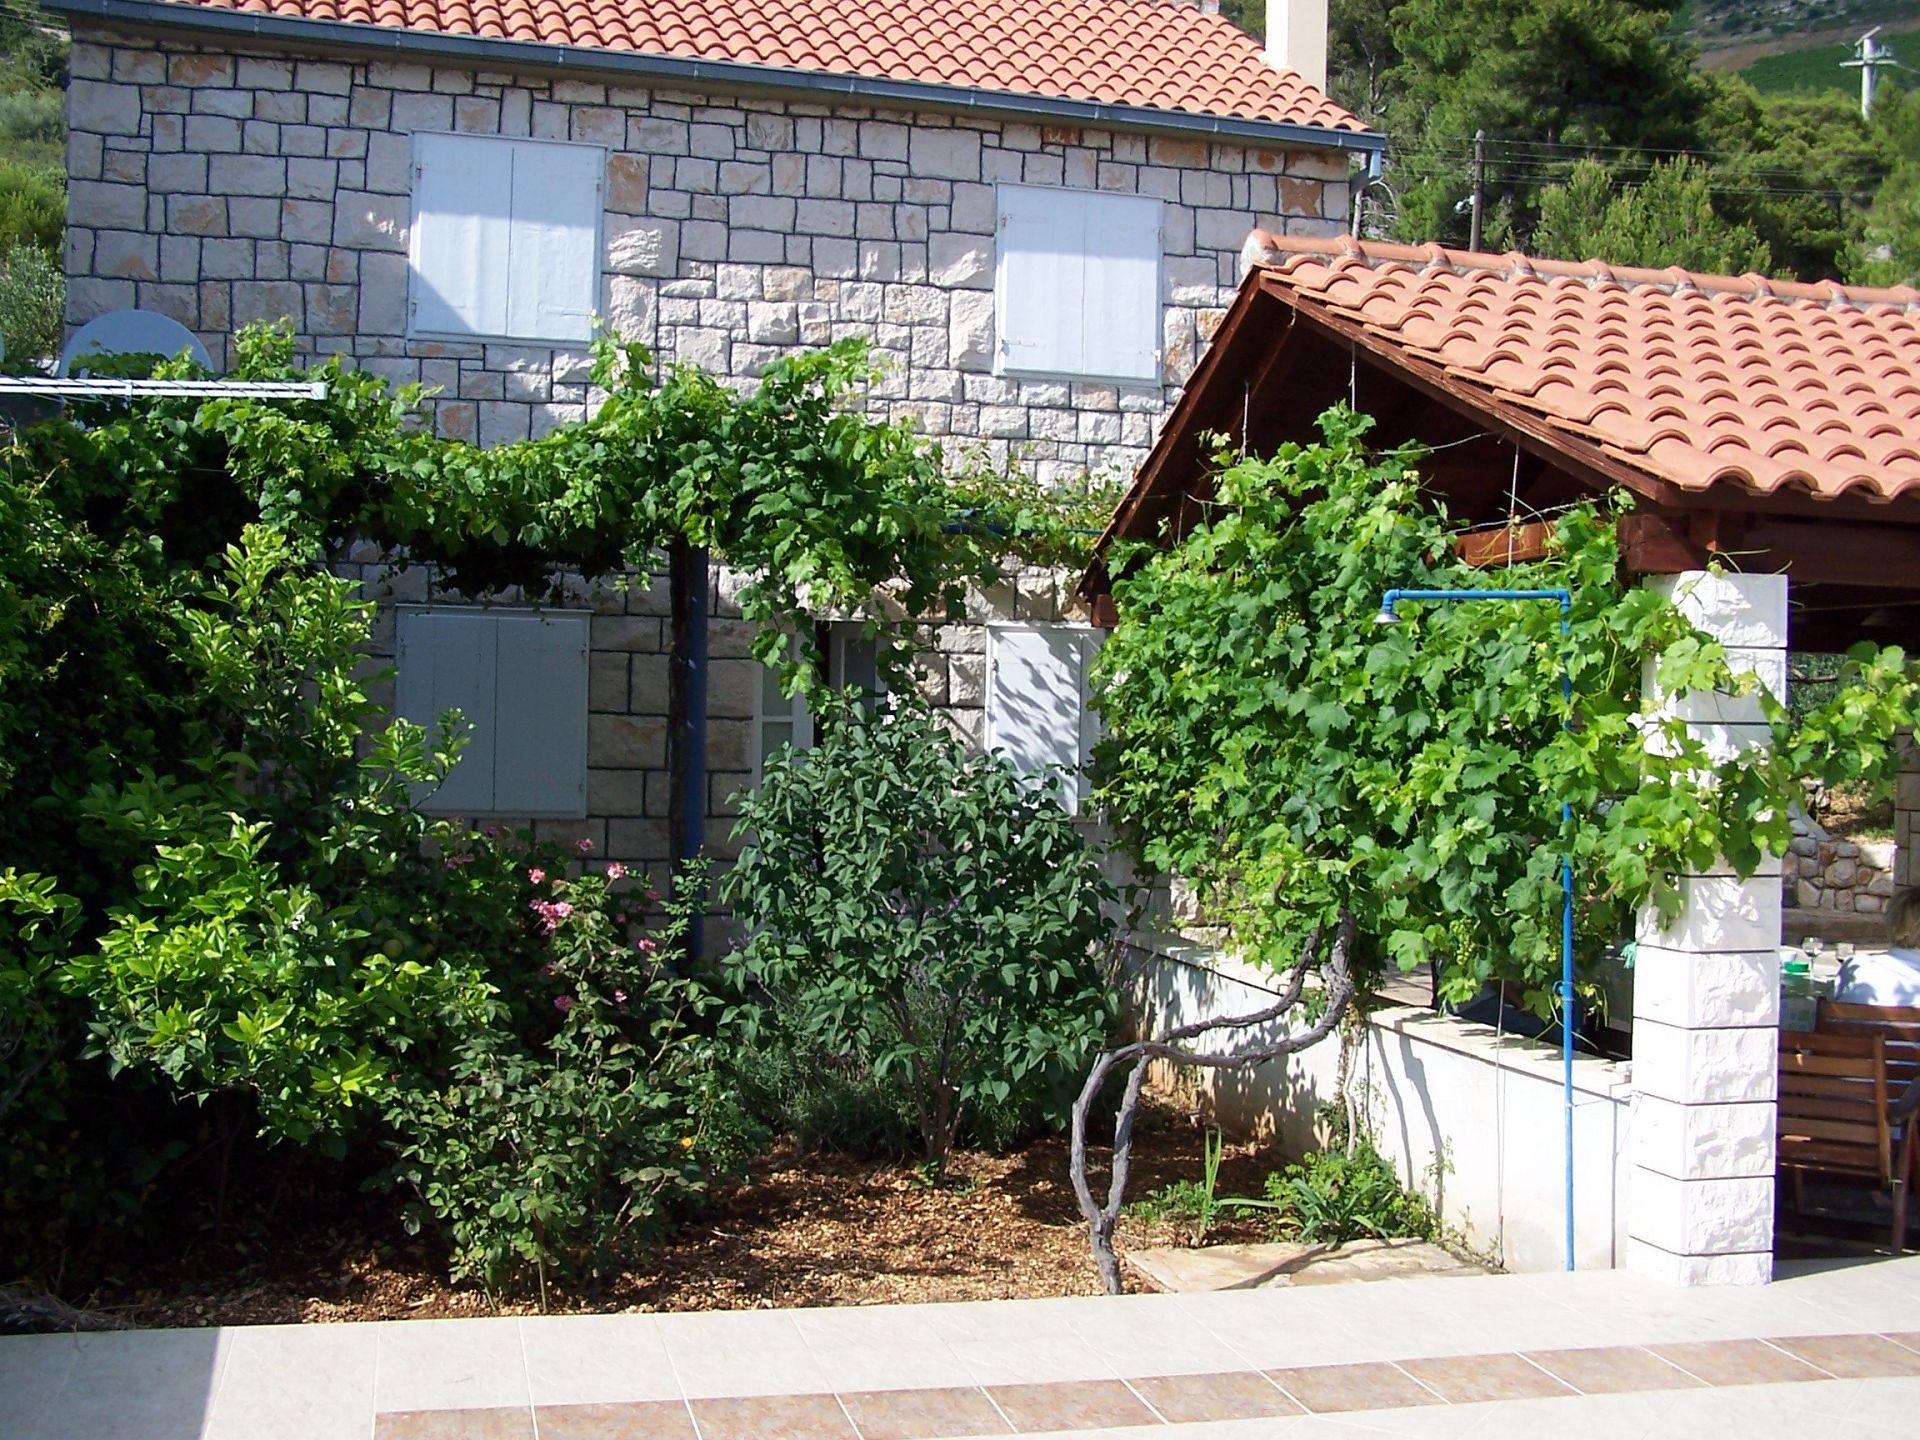 3383 - Bojanic Bad - Vakantiehuizen, villa´s Kroatië